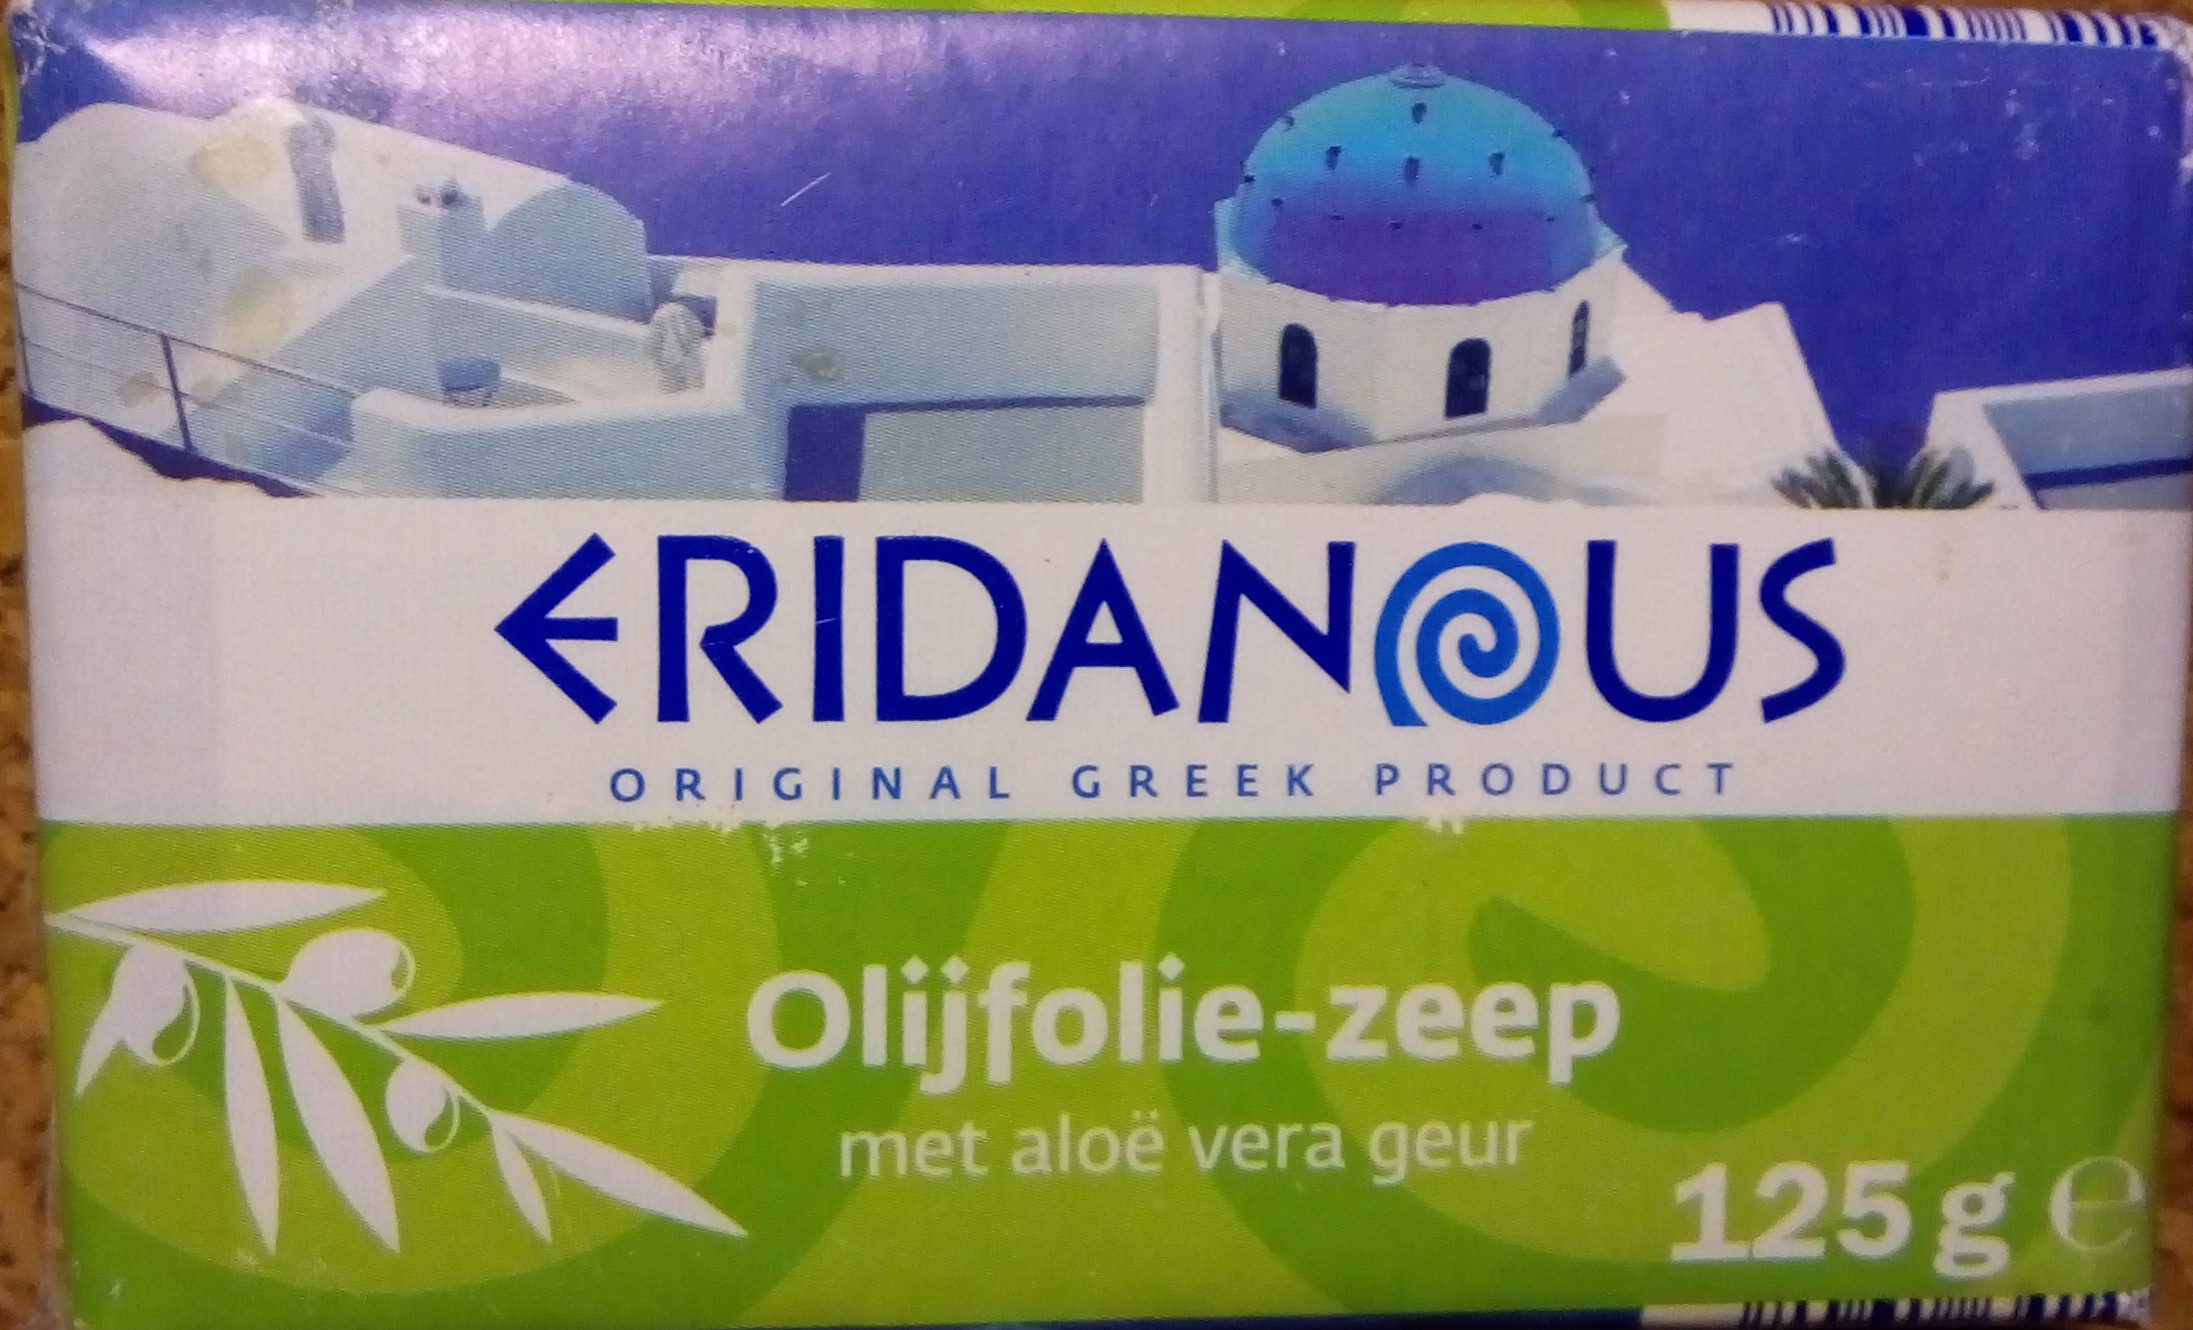 Olijfolie-zeep met aloe vera geur - Product